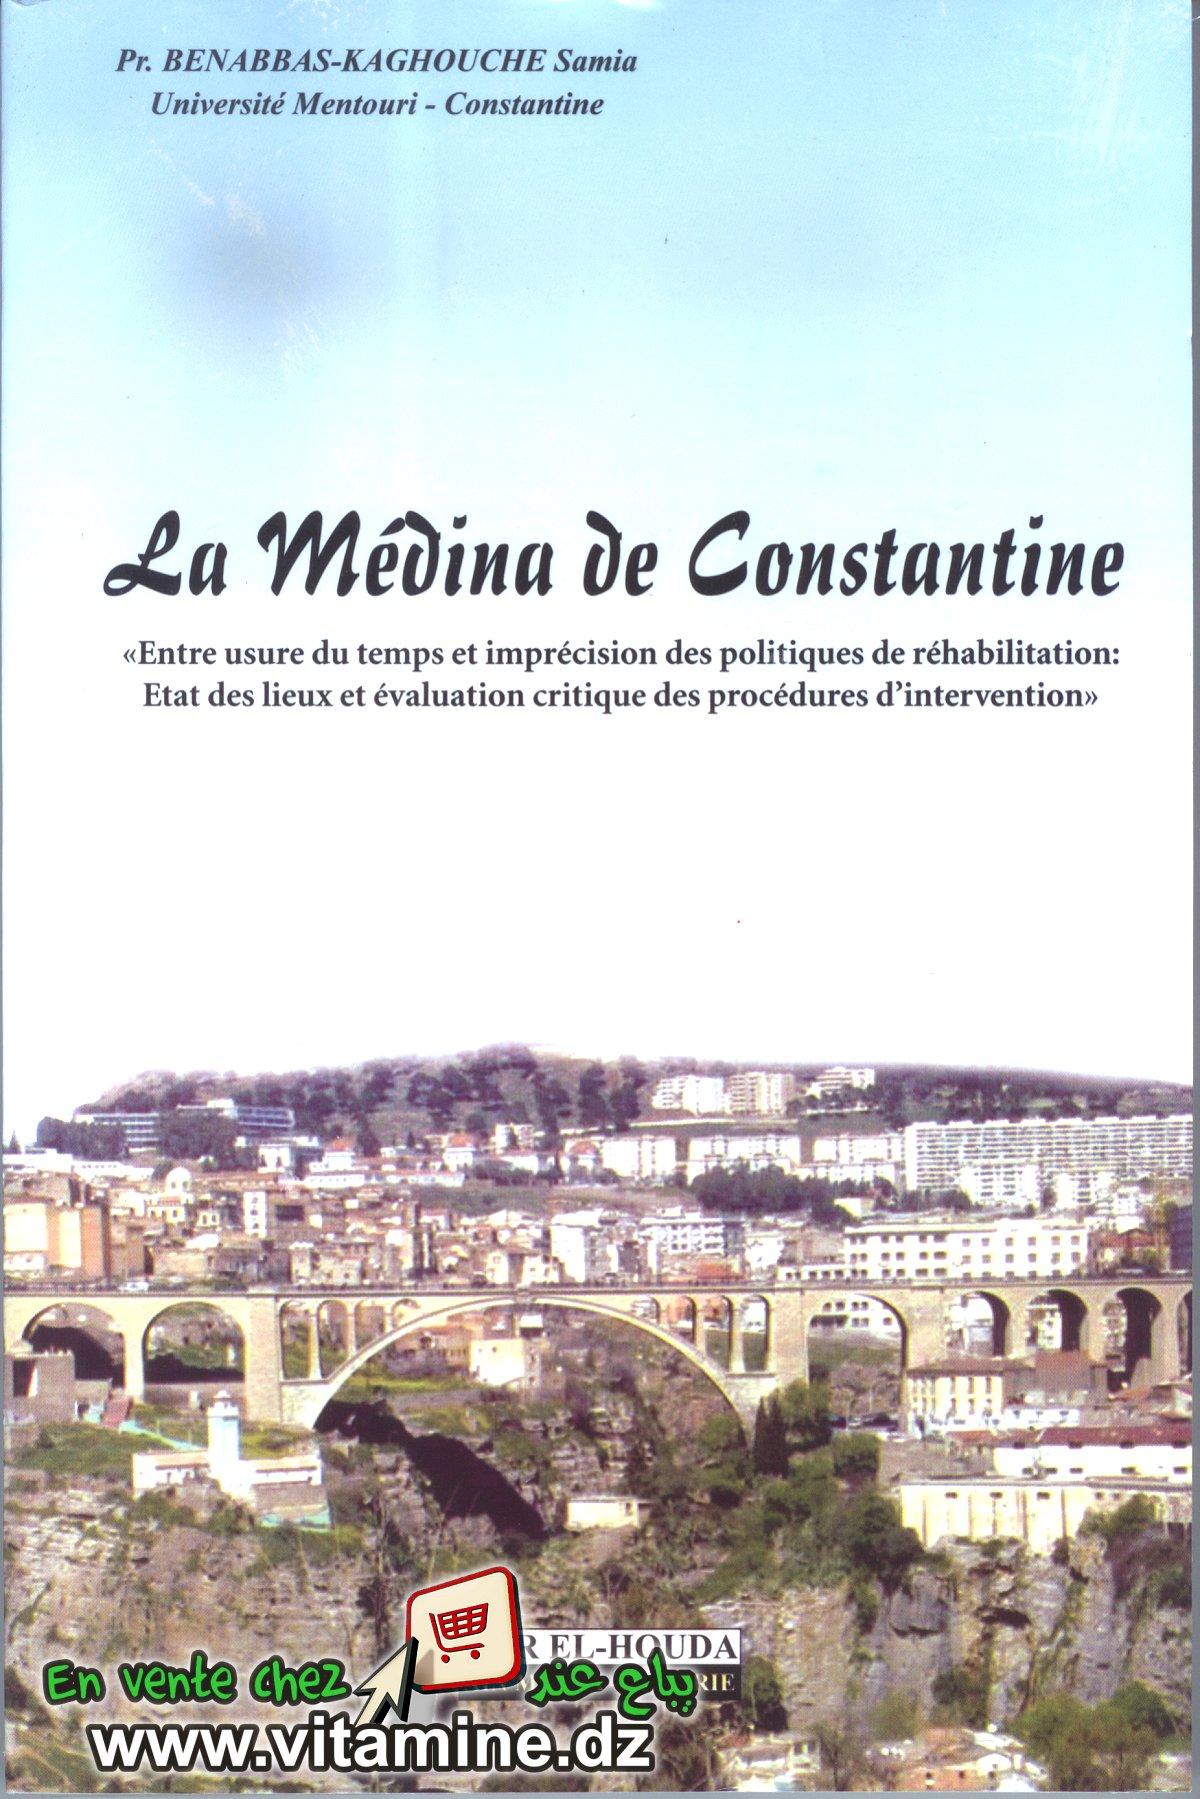 Pr. BENABBAS-KAGHOUCHE Samia - La Médina de Constantine